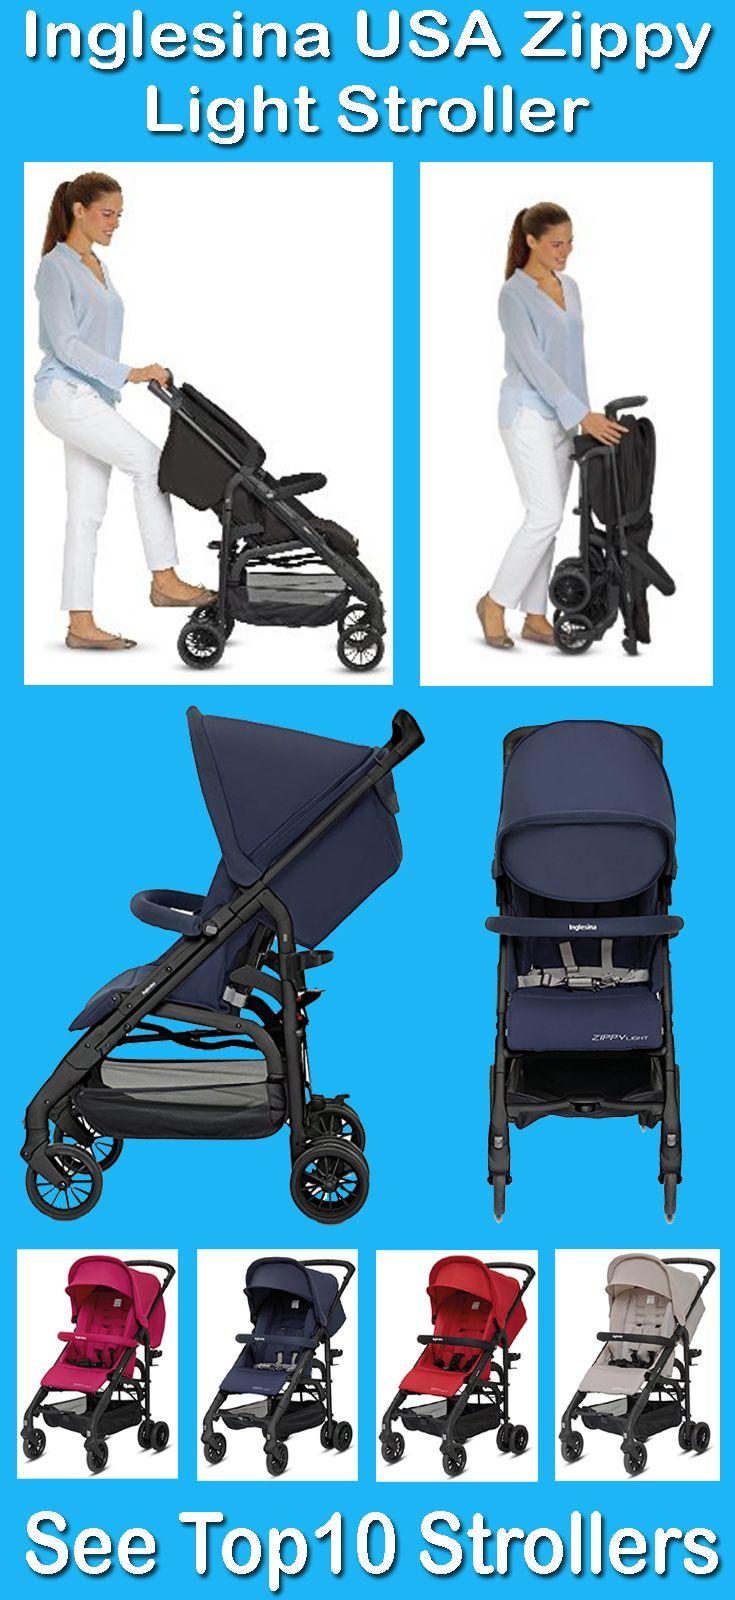 Inglesina Zippy Light Stroller features 3 position fully